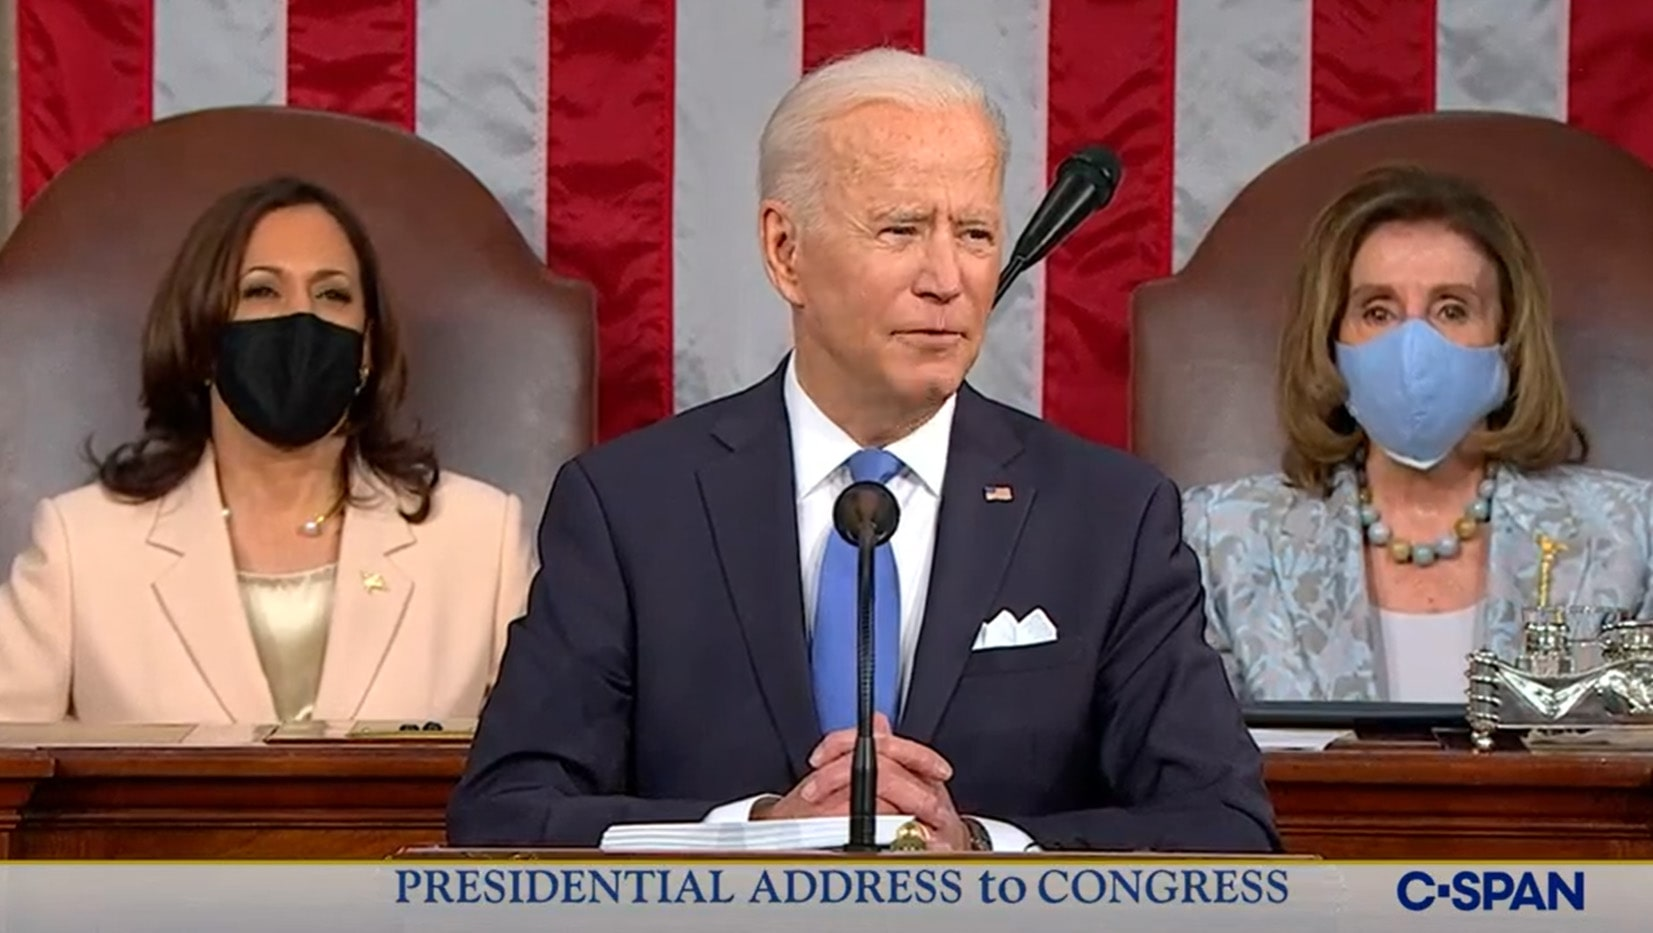 A 'dose of hope?' Fact-checking President Joe Biden's first speech to Congress